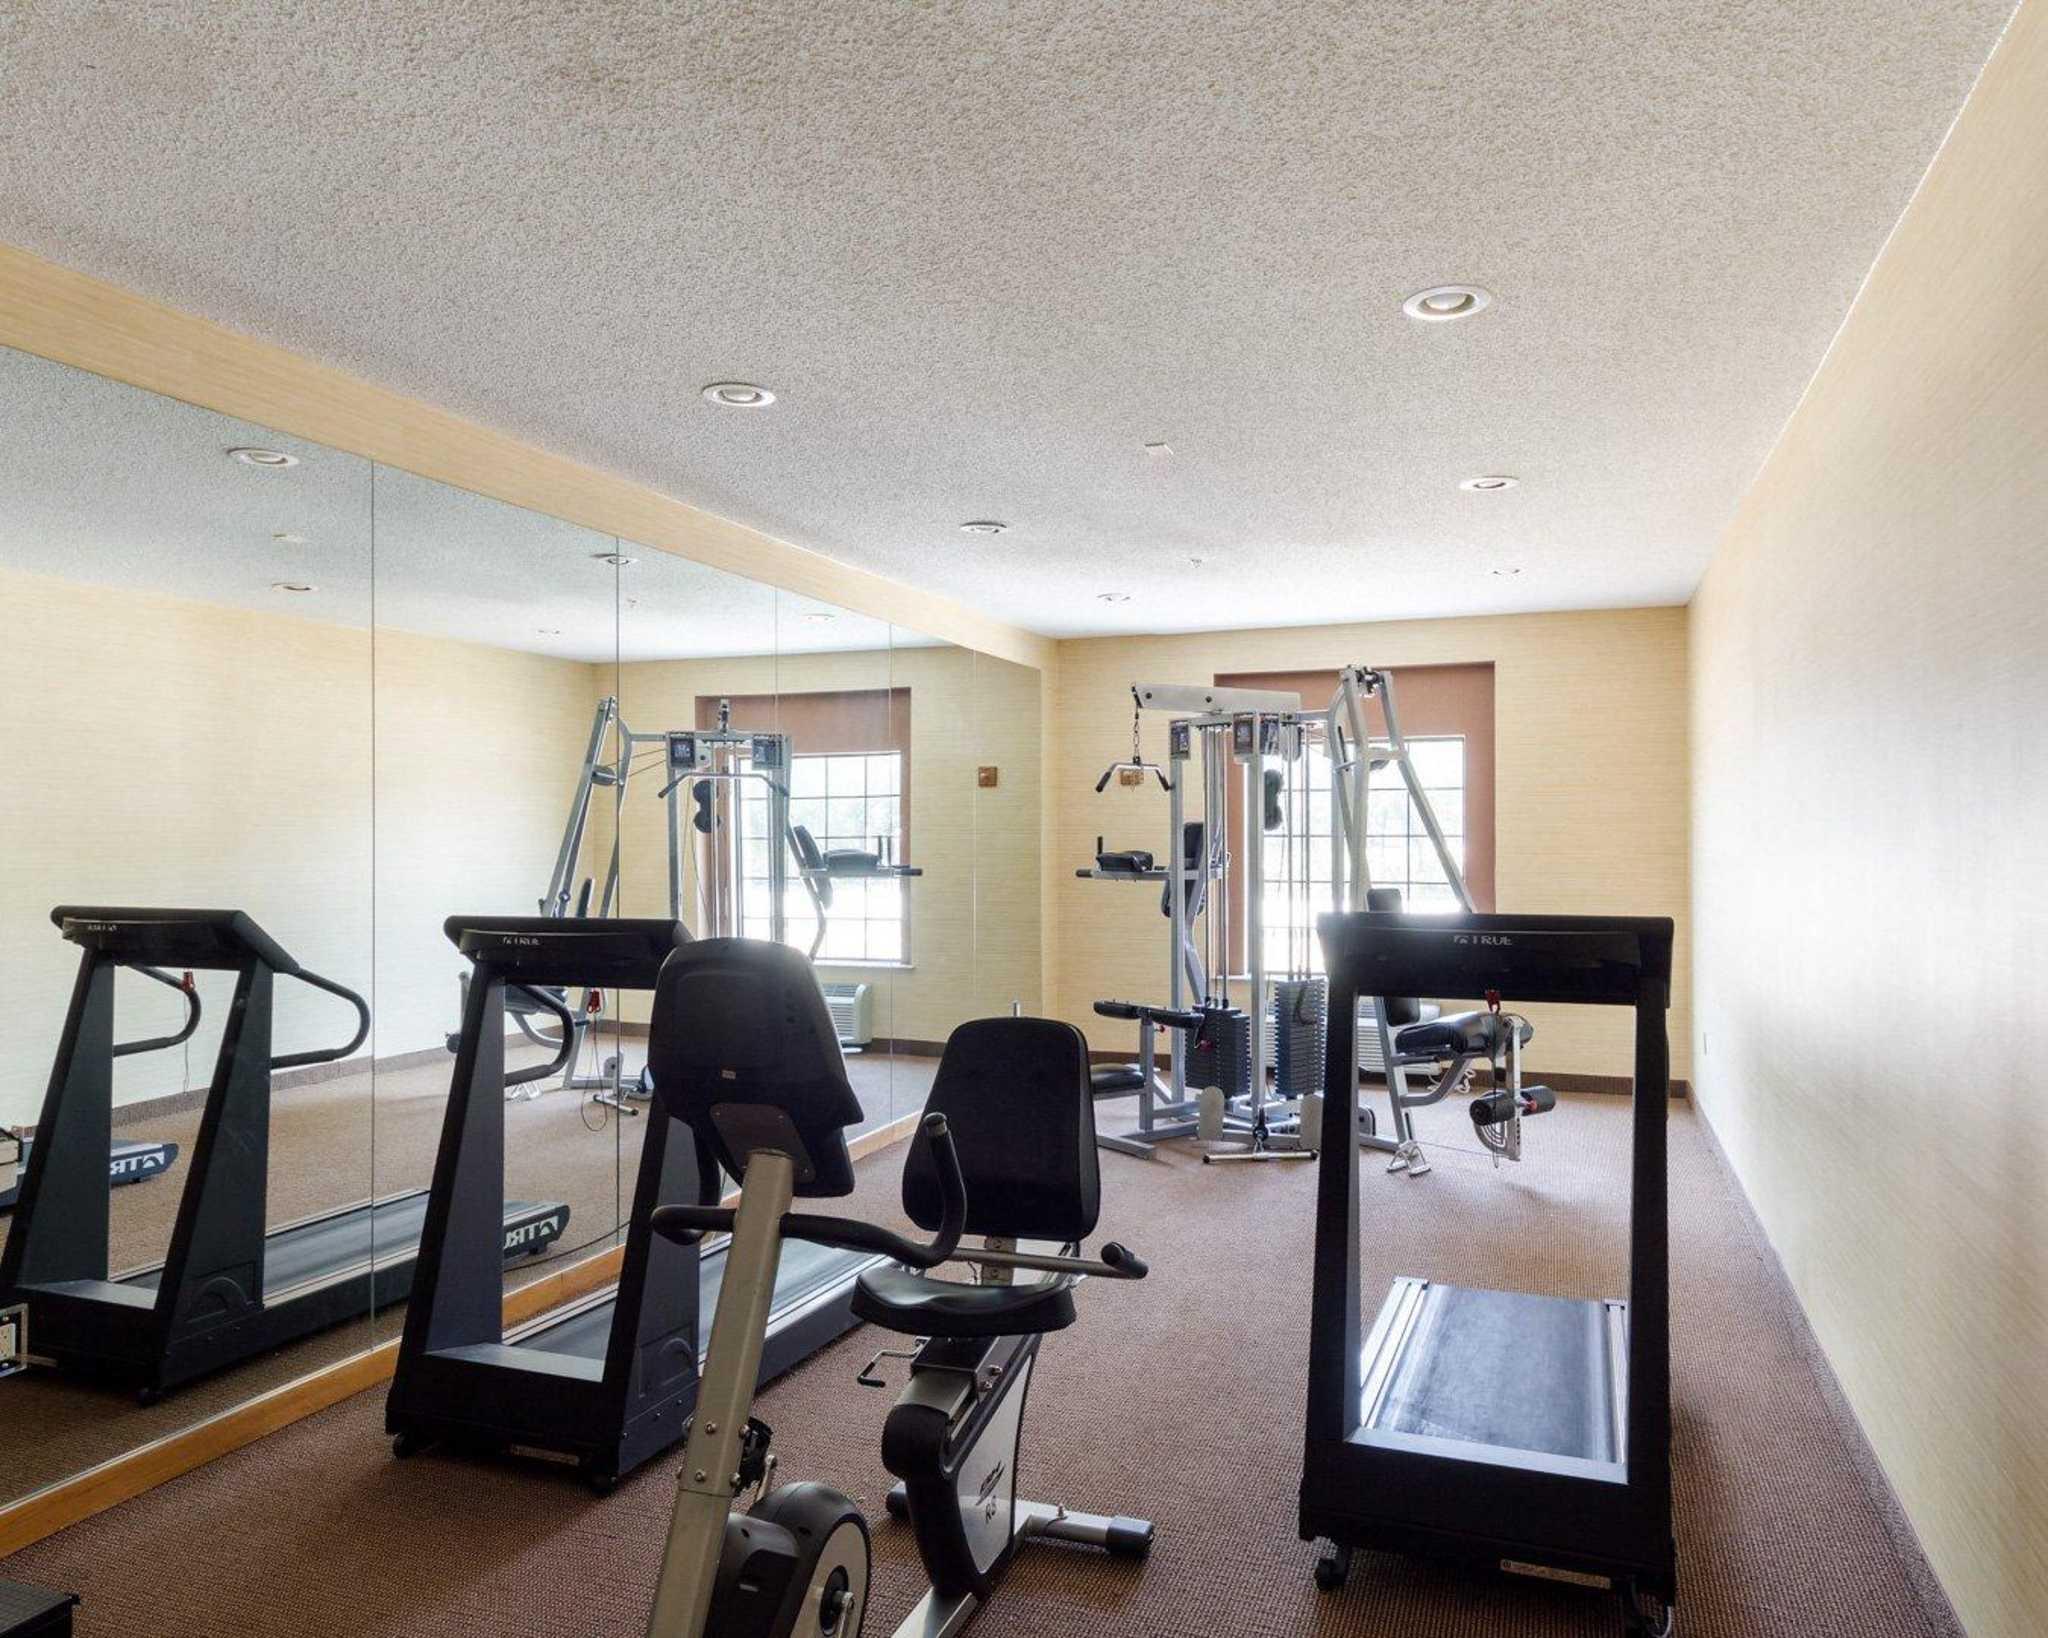 Comfort Inn & Suites image 35